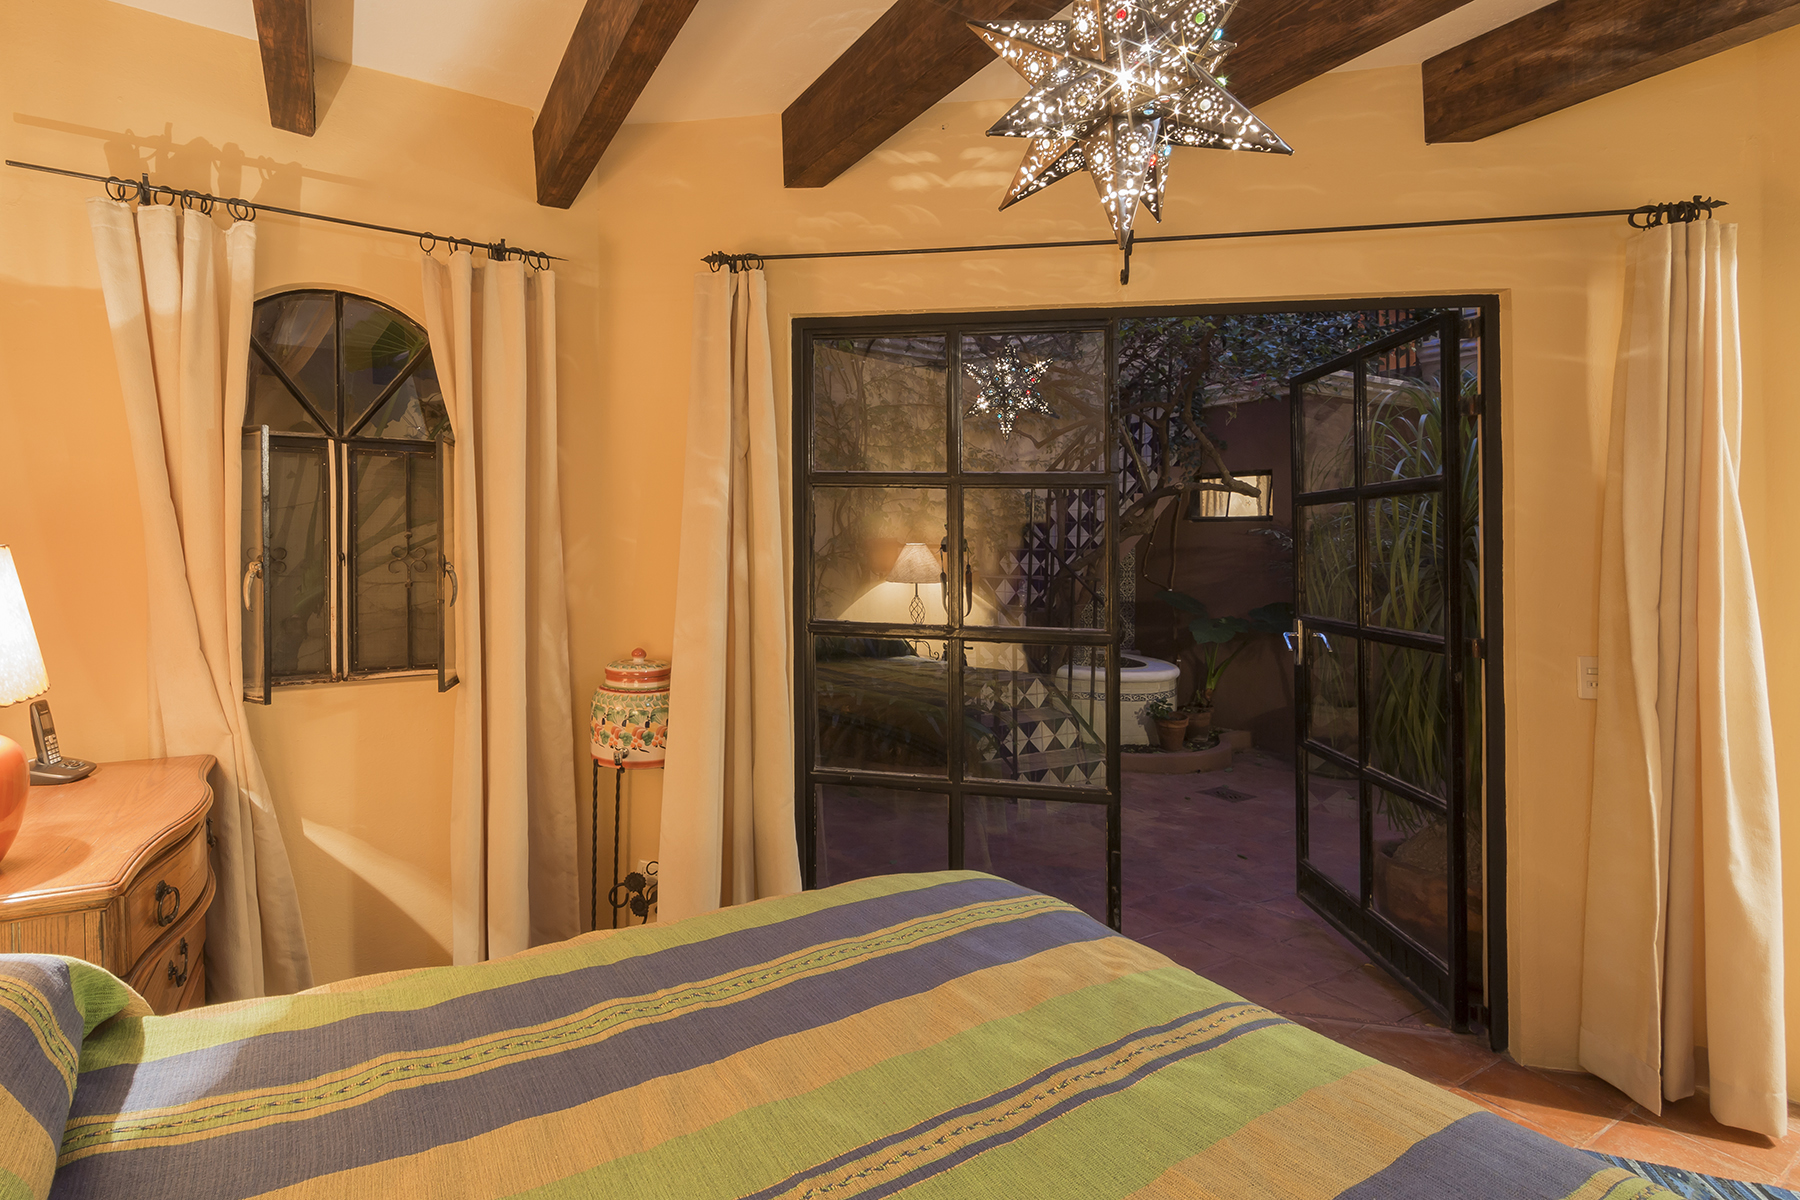 Additional photo for property listing at CASA LORETO Centro, San Miguel De Allende, Guanajuato México